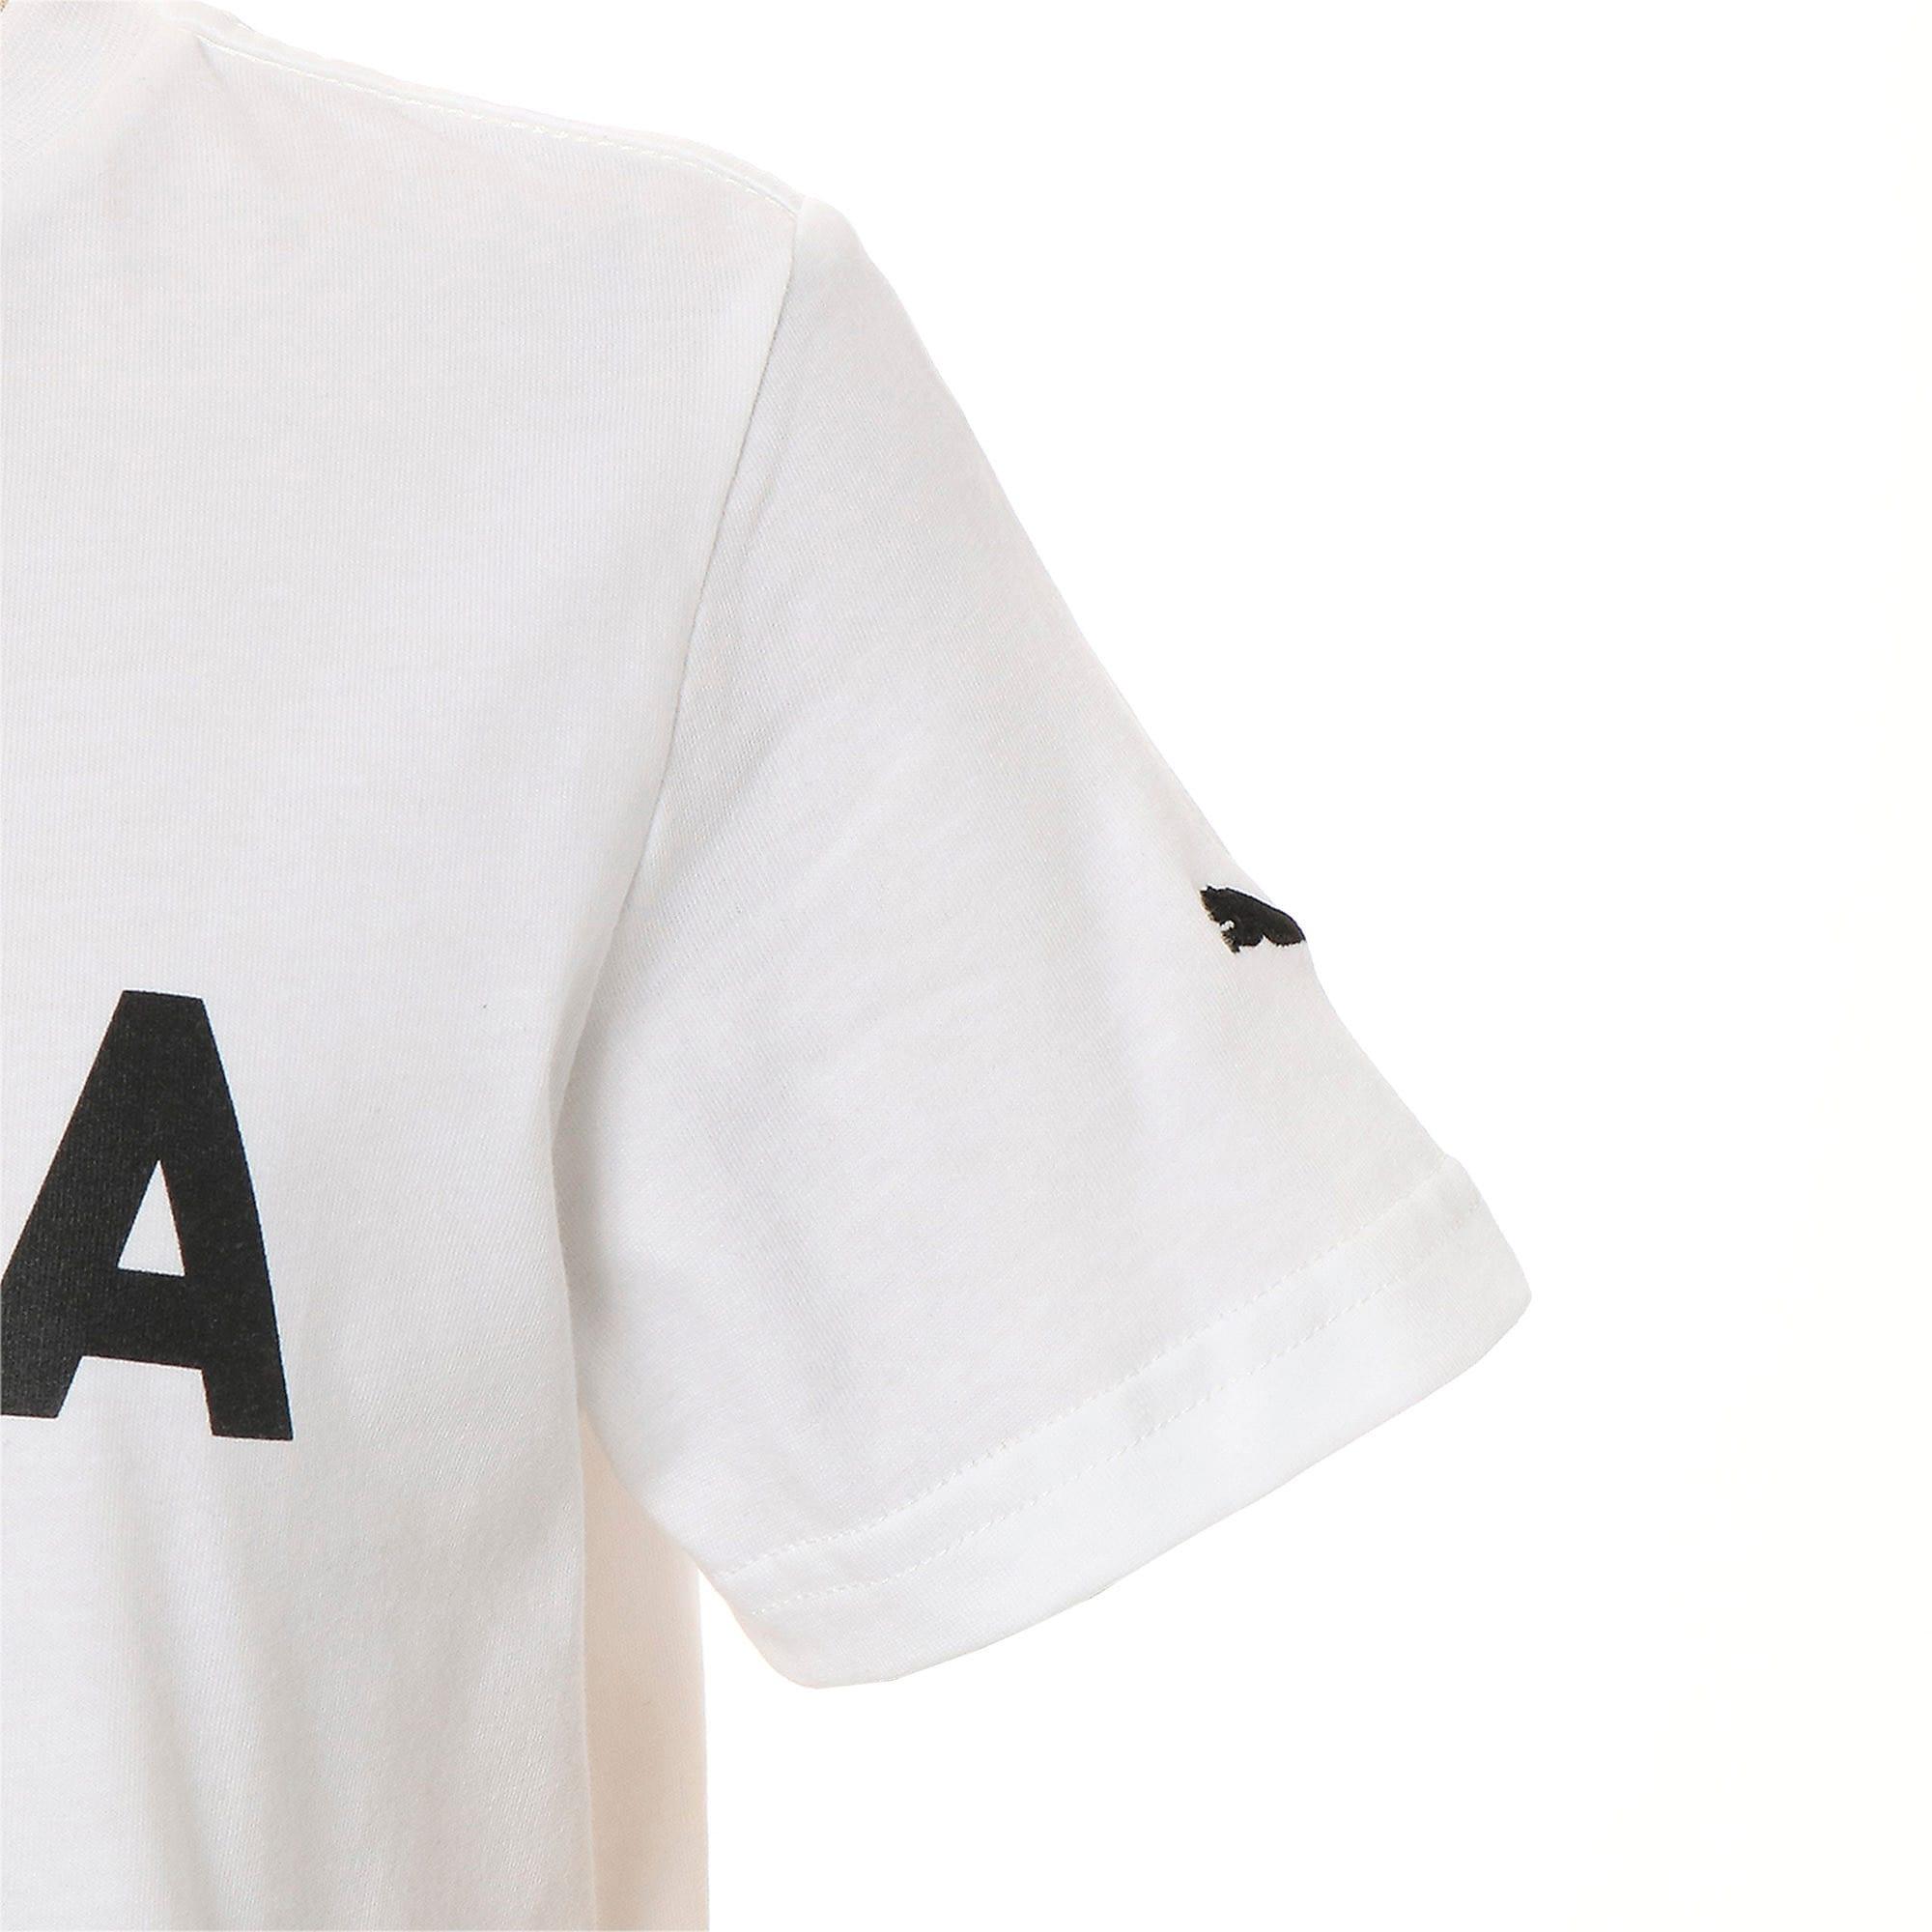 Thumbnail 5 of キッズ シティー 半袖 Tシャツ 2 OSAKA 大阪, Puma White, medium-JPN